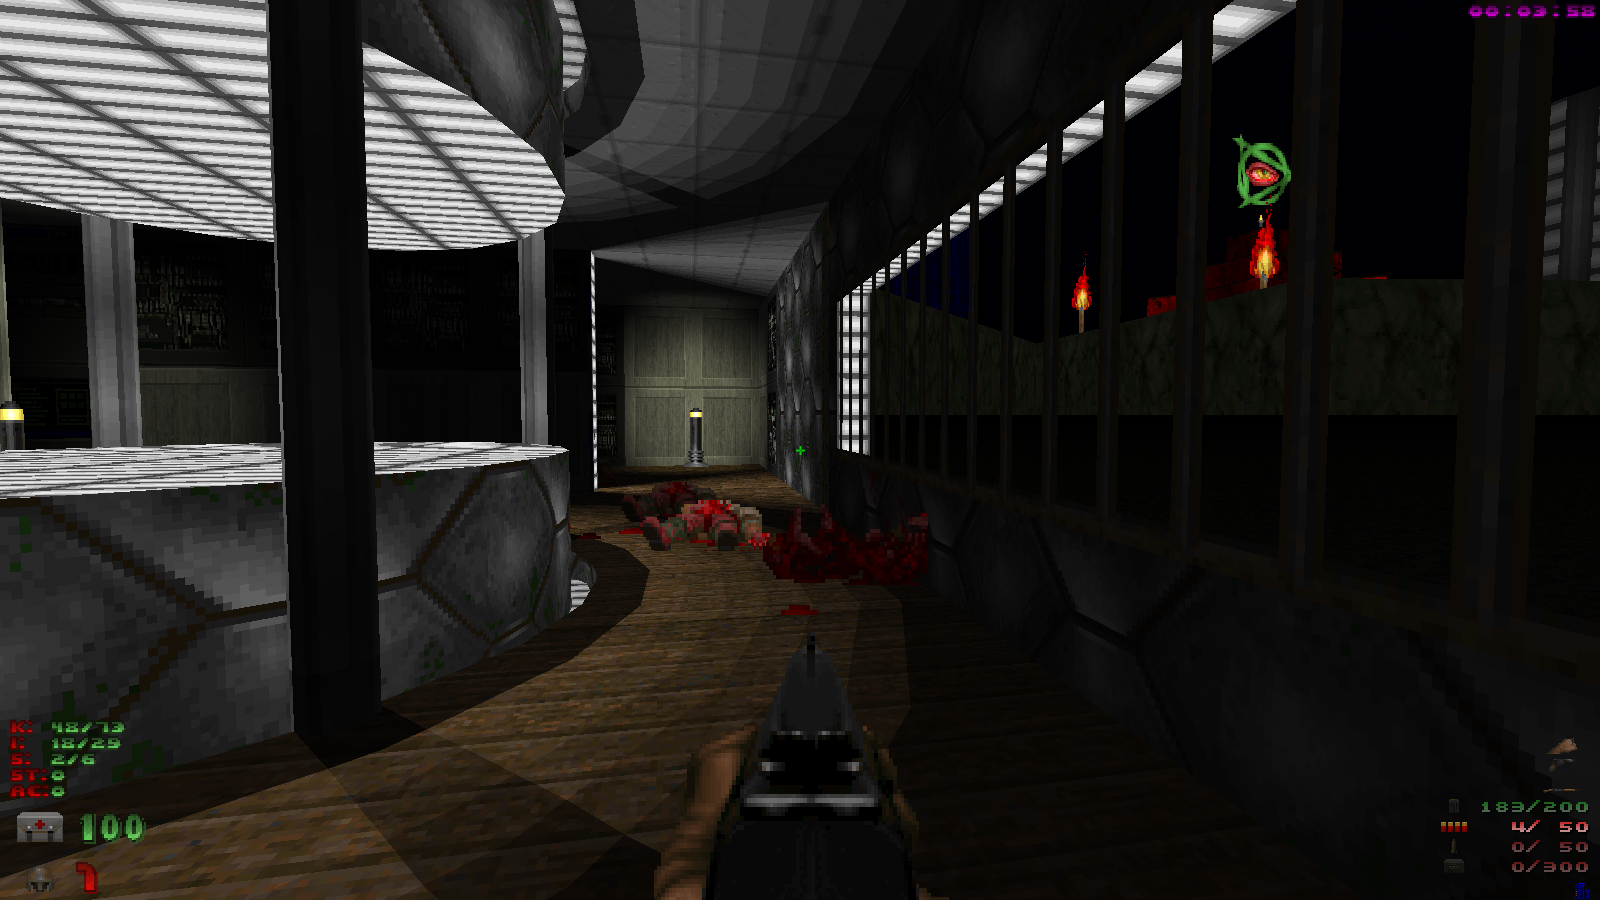 Screenshot_Doom_20190807_202320.png.1b1d5acba904ae9aa84b0ee86399b0e6.png